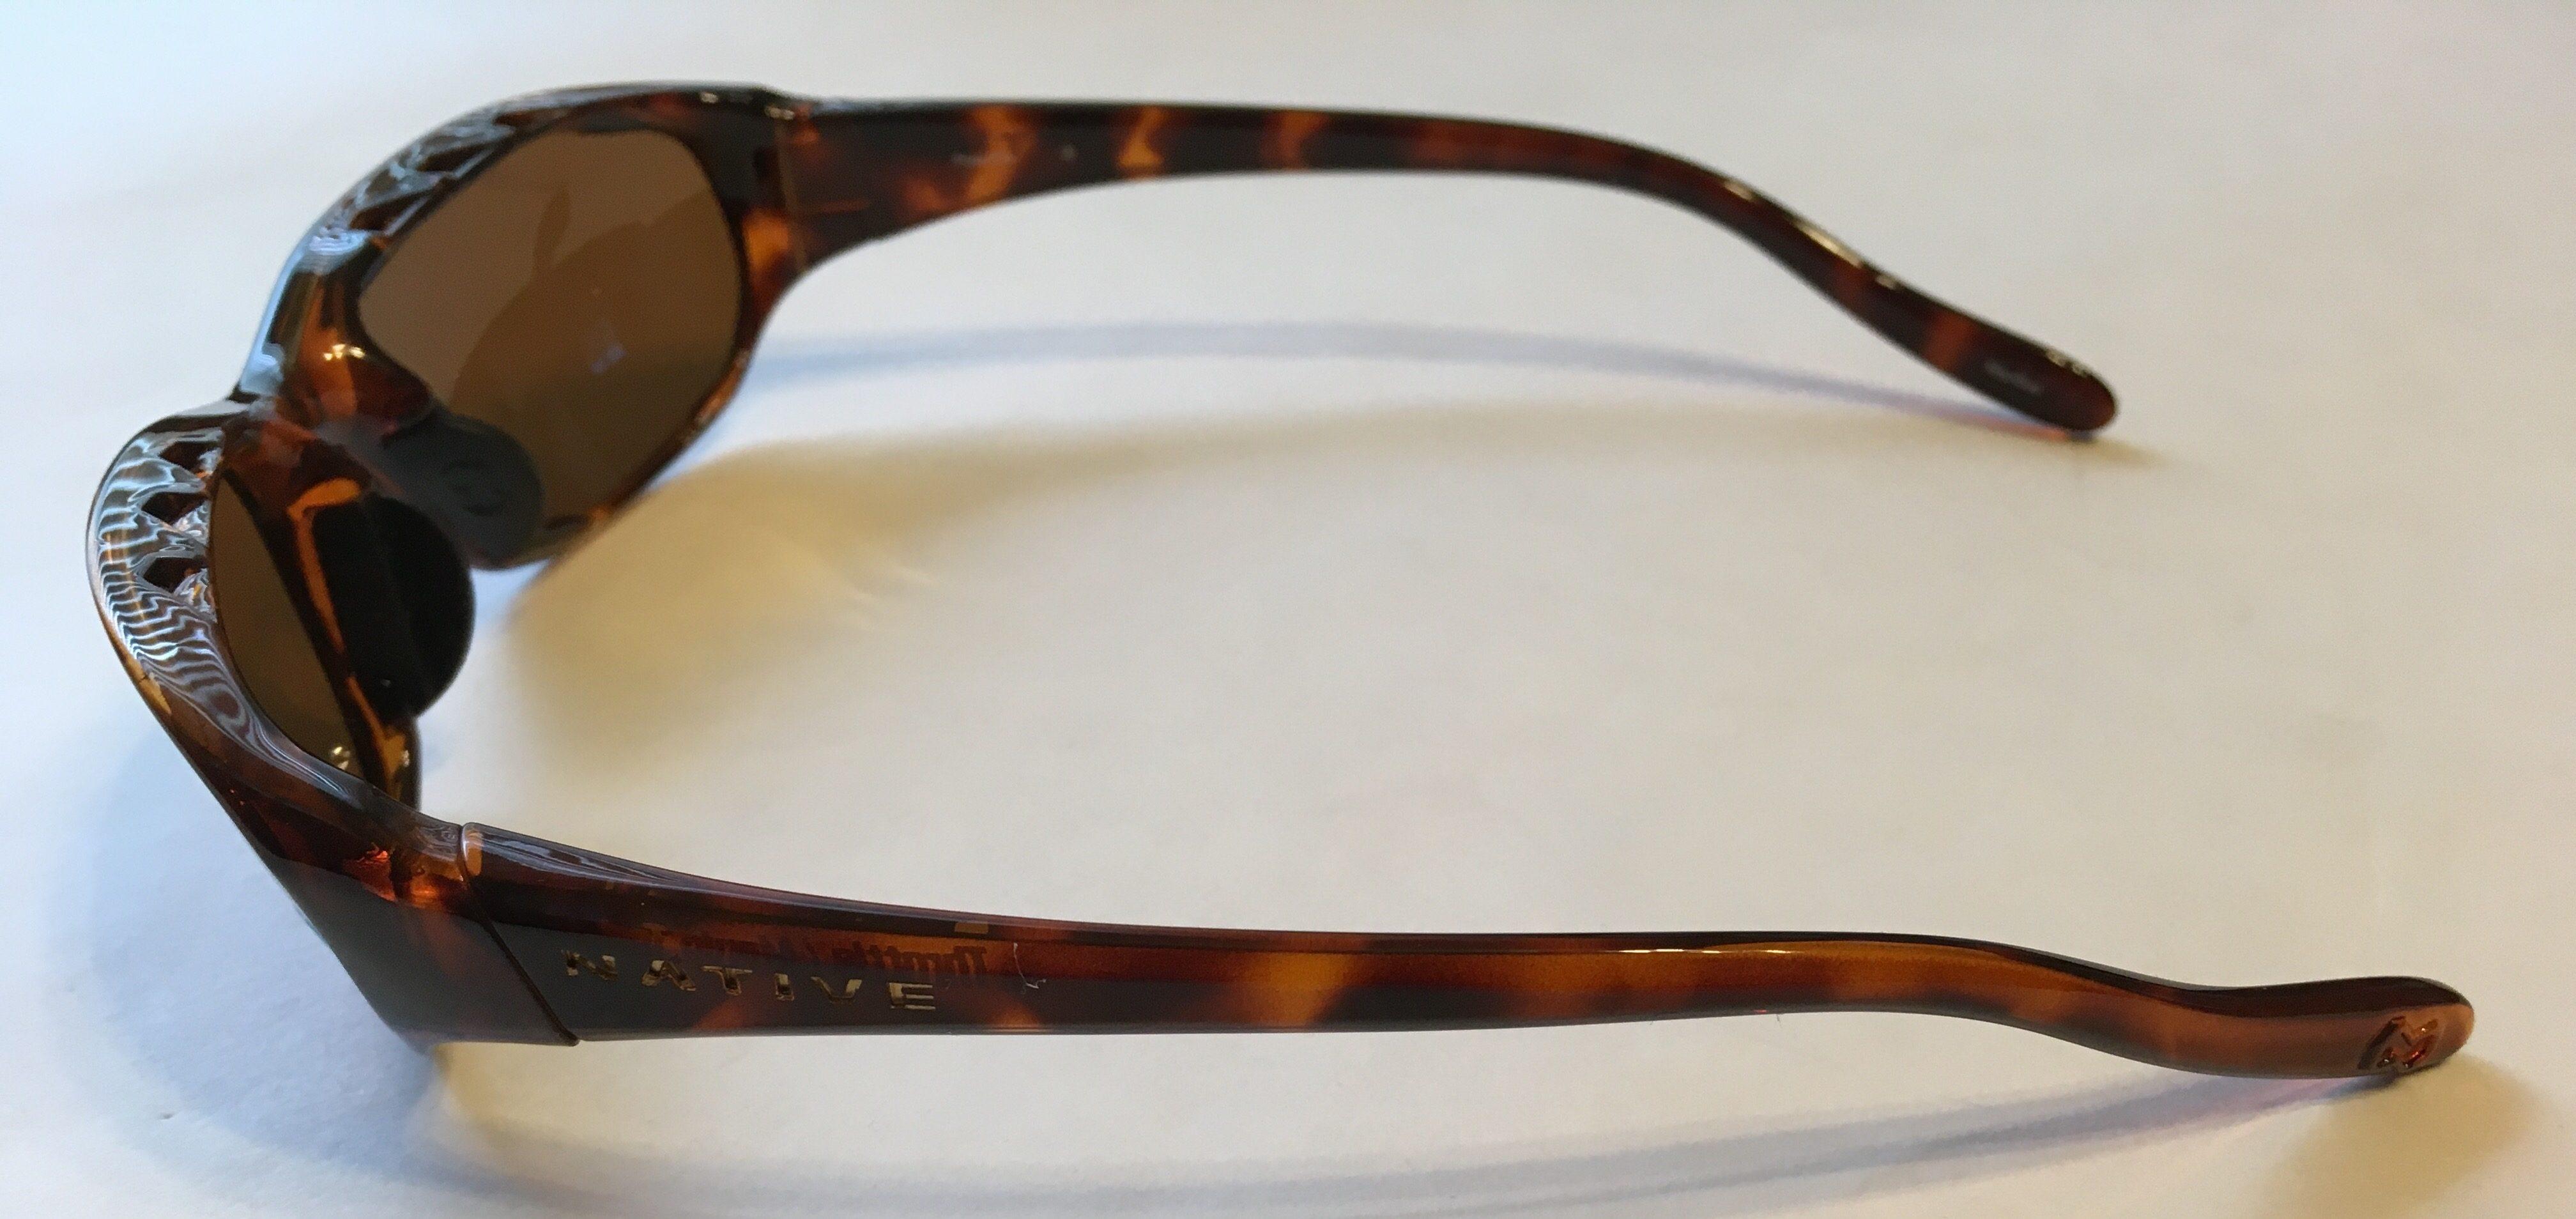 Native Eyewear Throttle Sunglasses - Maple Tortoise - POLARIZED Brown Lens